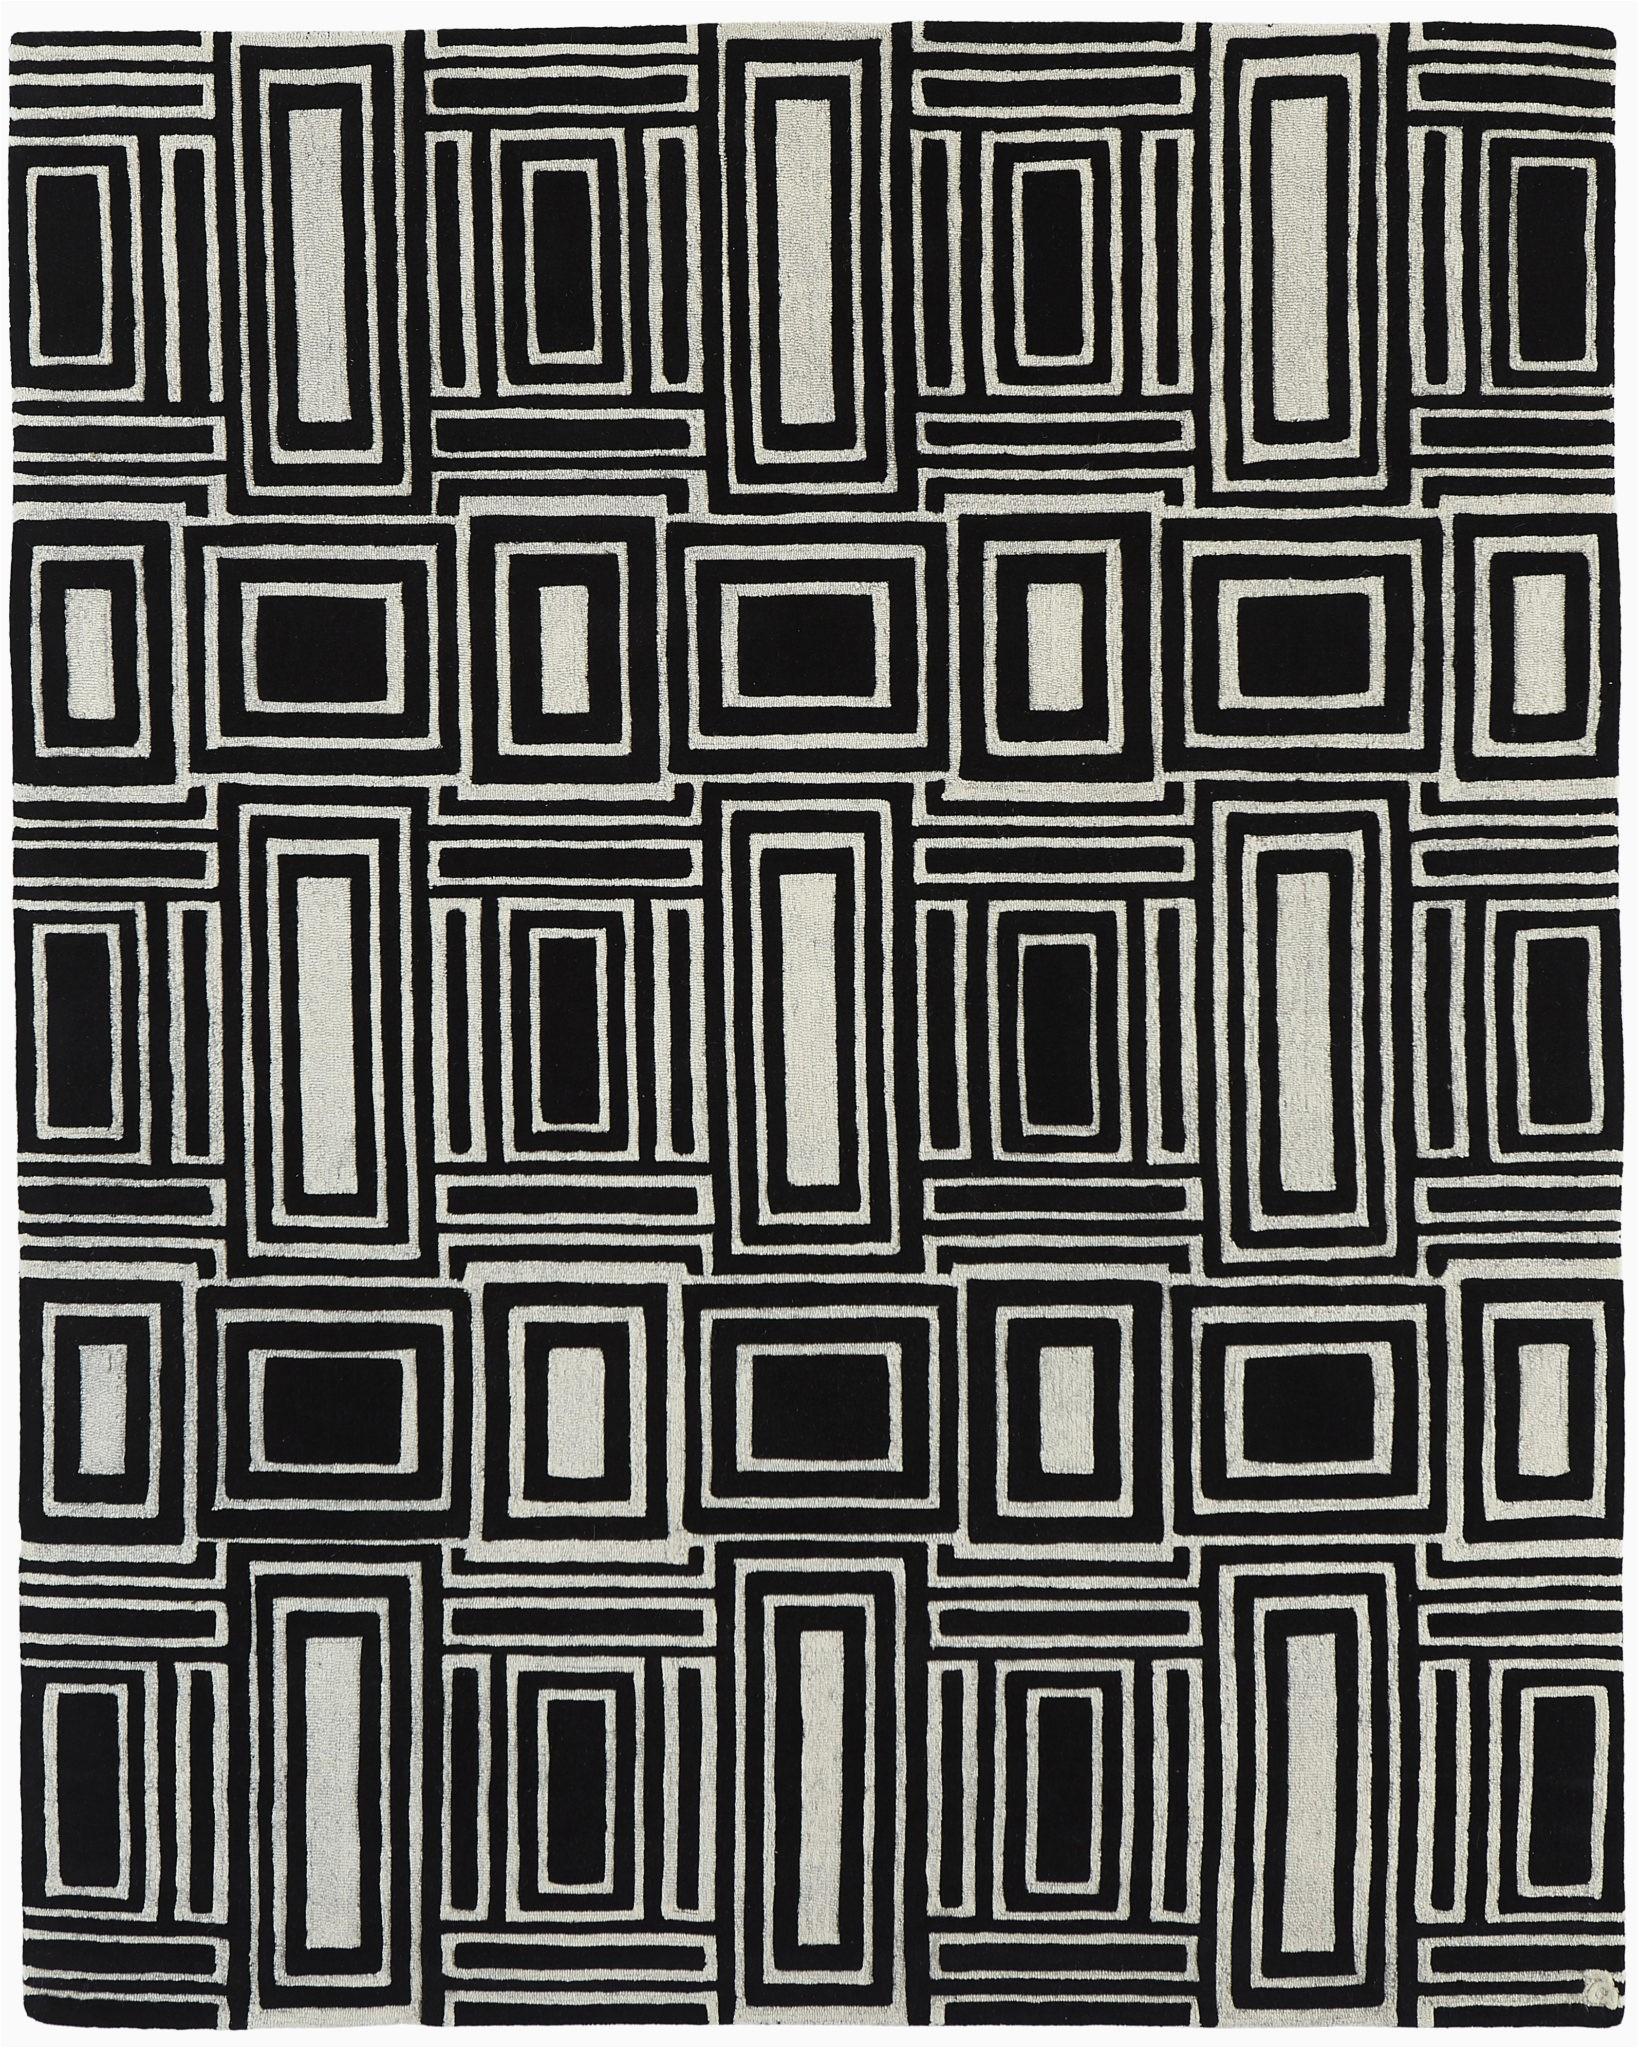 Eli Black and White 8x10 Full 1